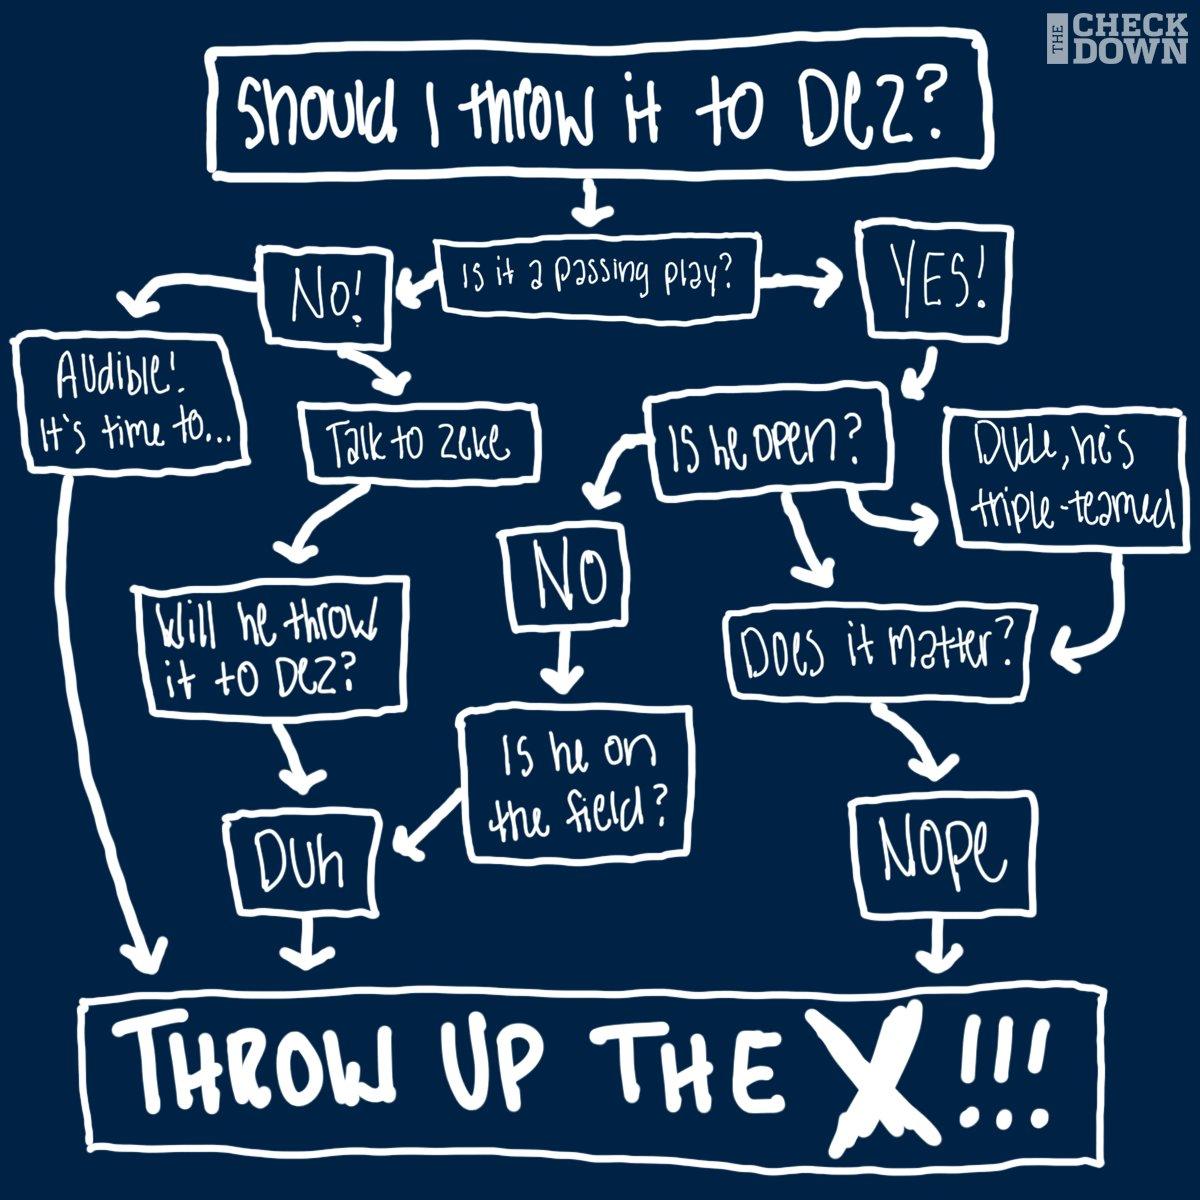 #ThrowUpTheX